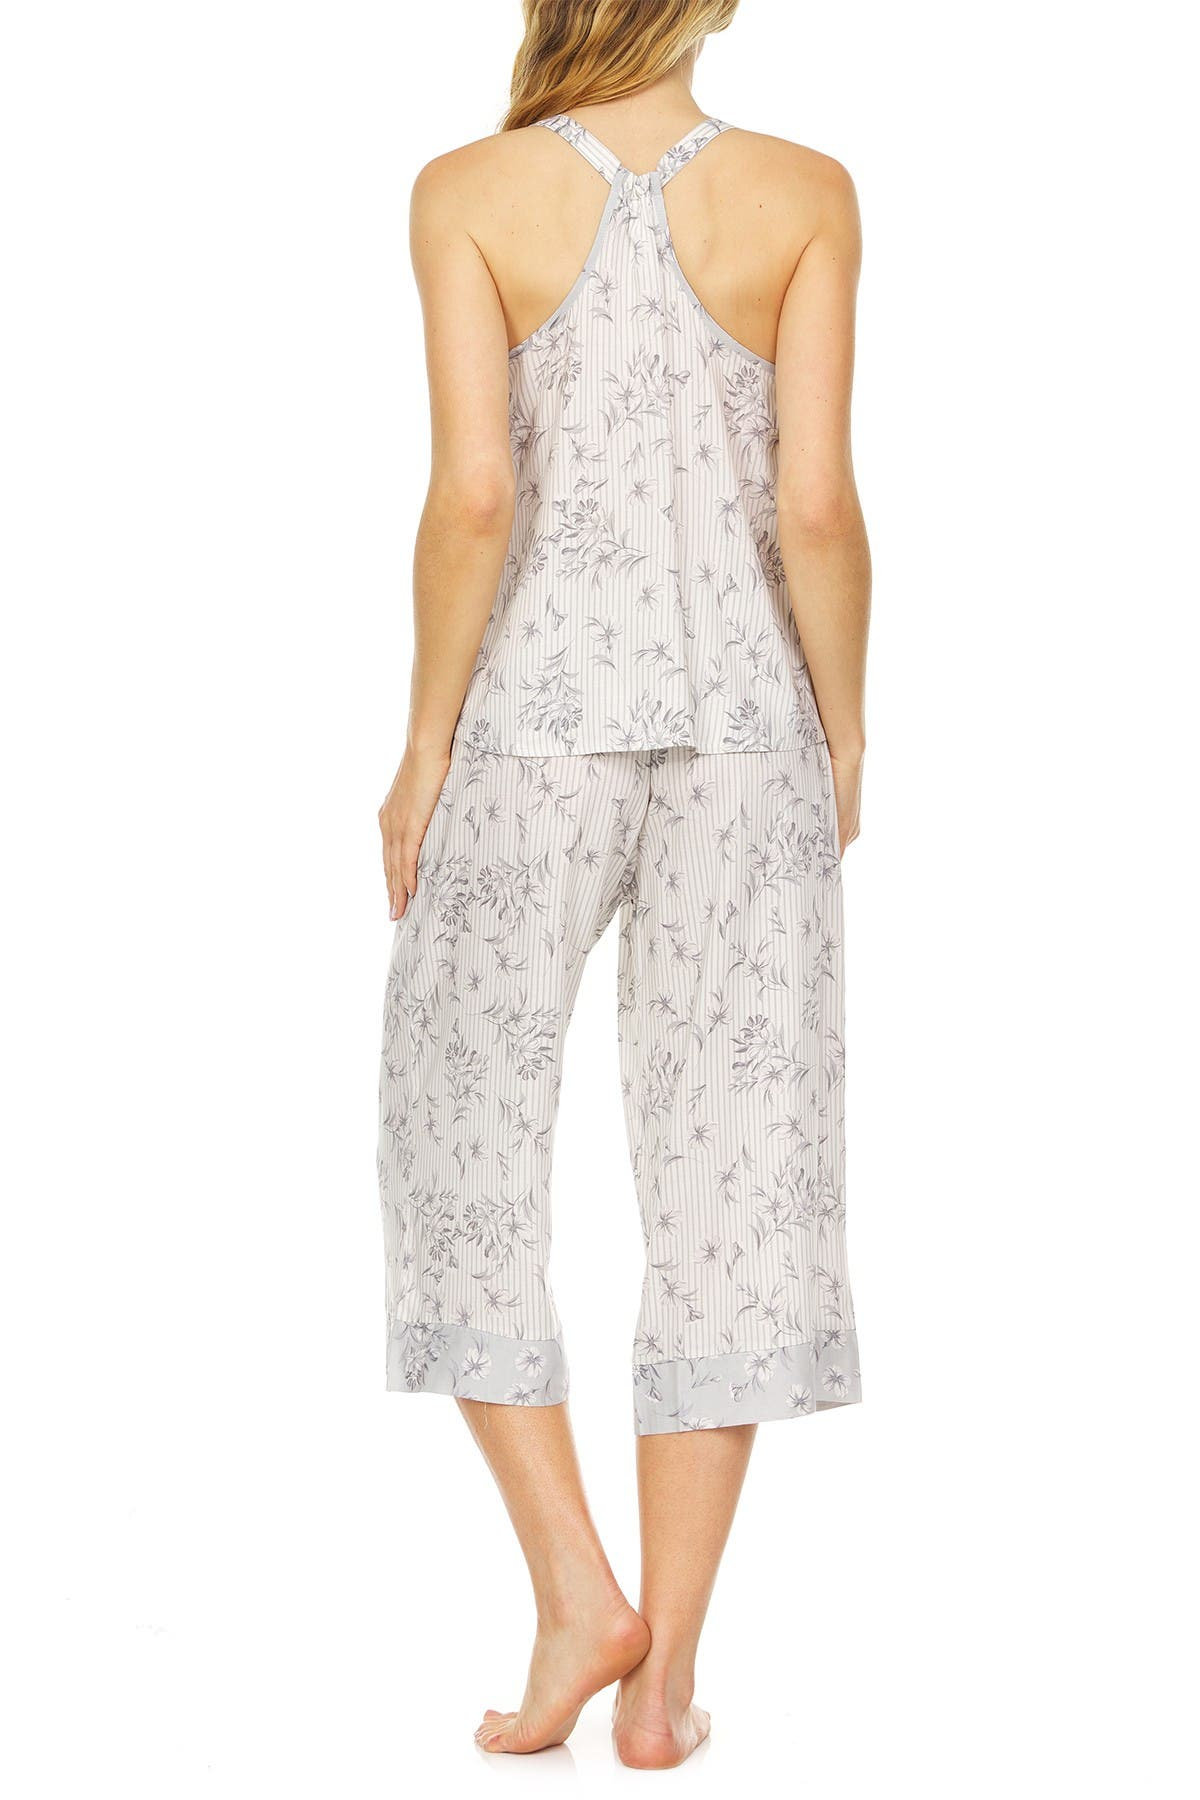 Image of Flora by Flora Nikrooz Mariah Tank & Cropped Pant 2-Piece Pajama Set